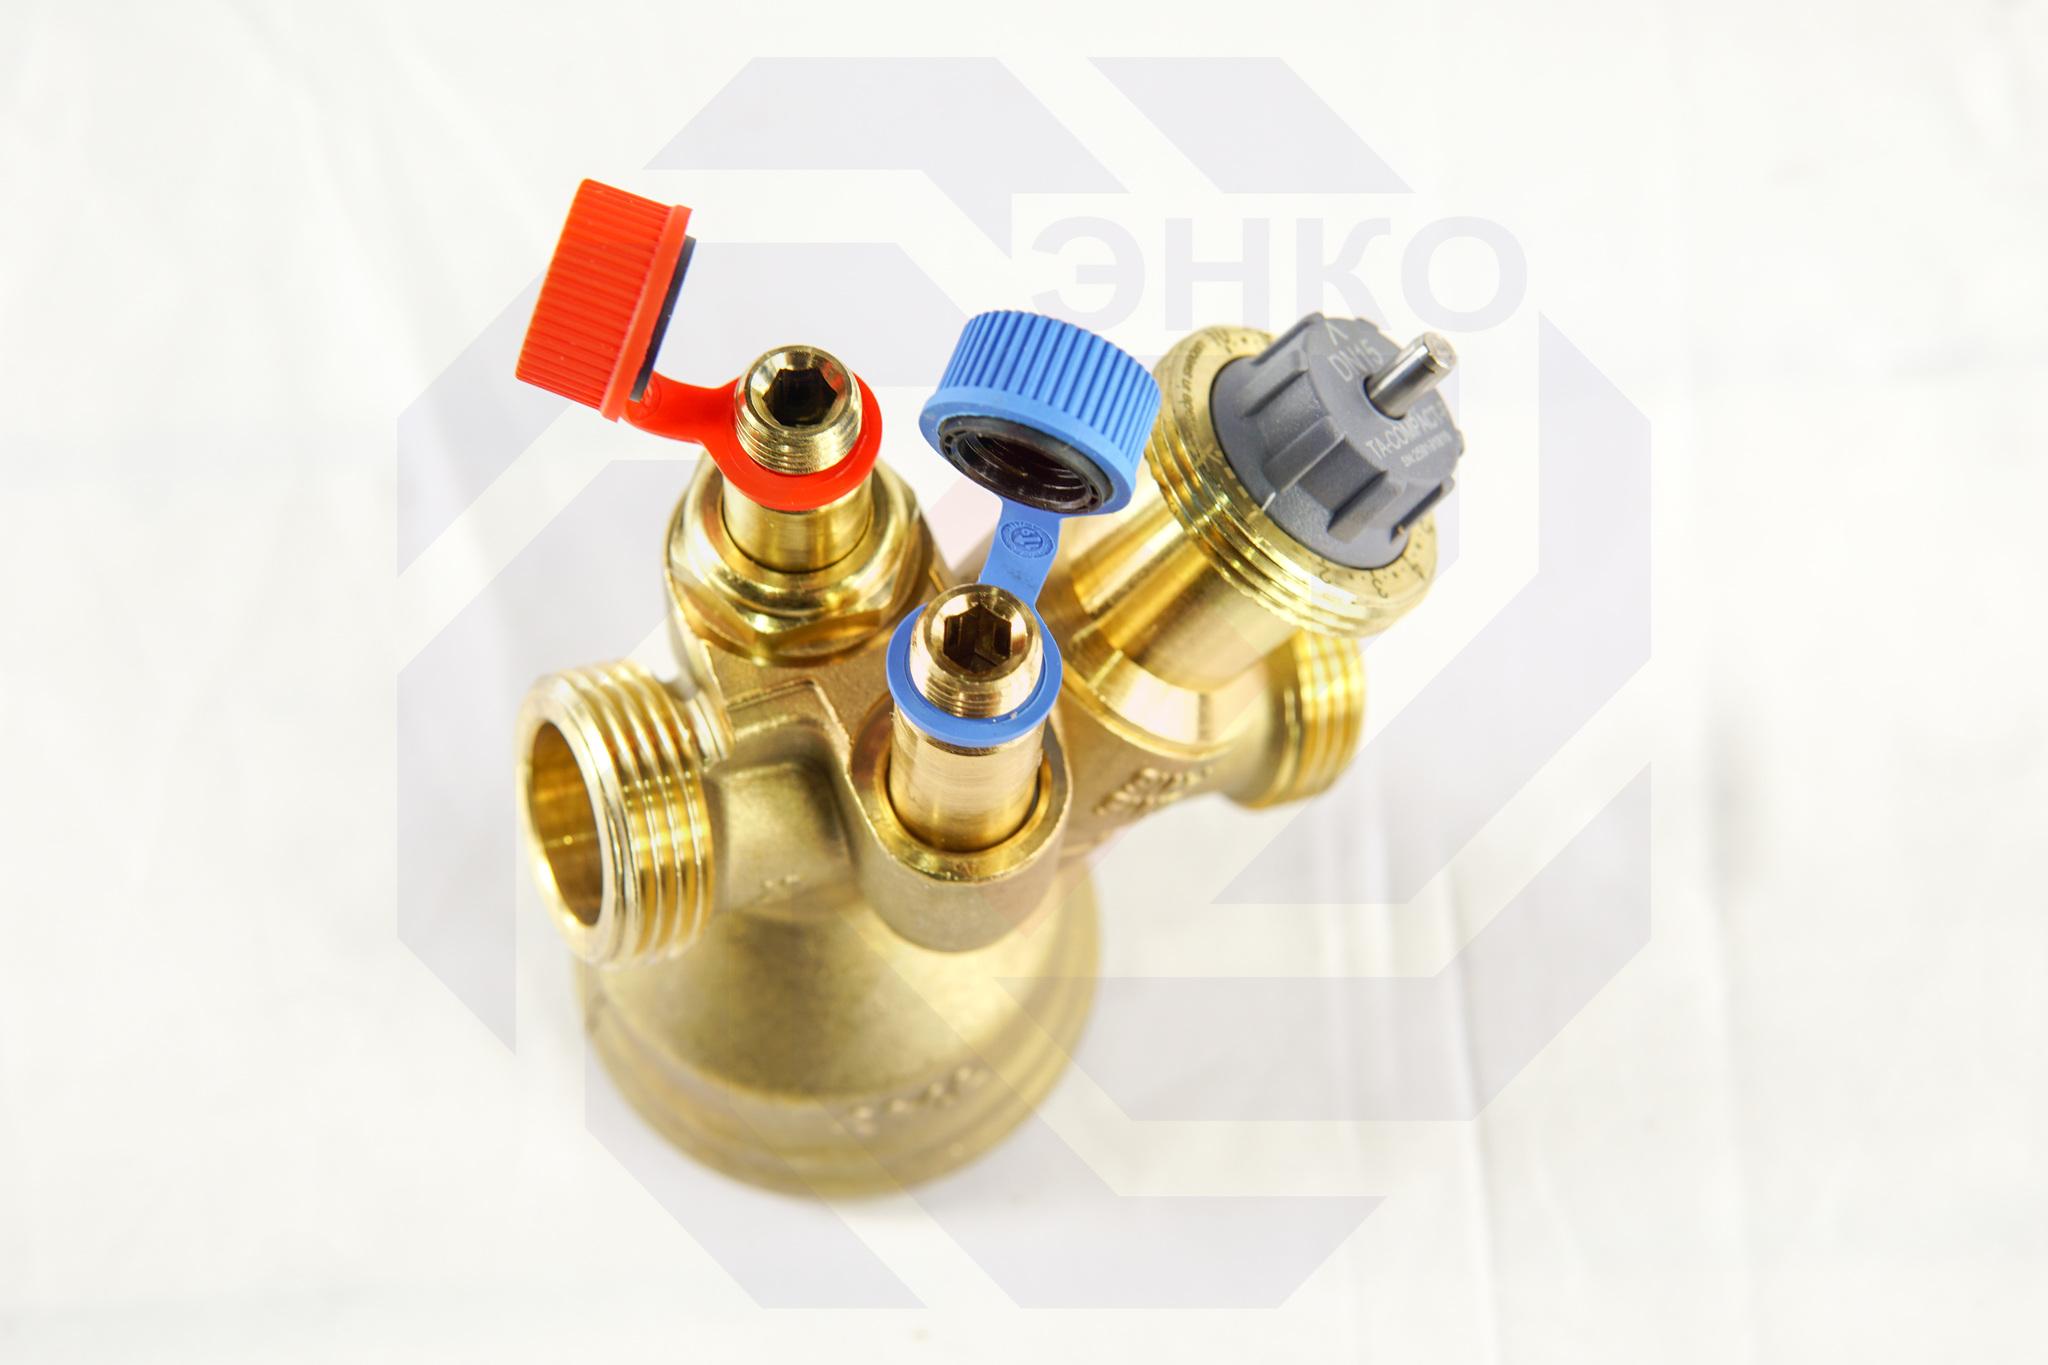 Клапан балансировочный и регулирующий IMI TA-COMPACT-P DN 25